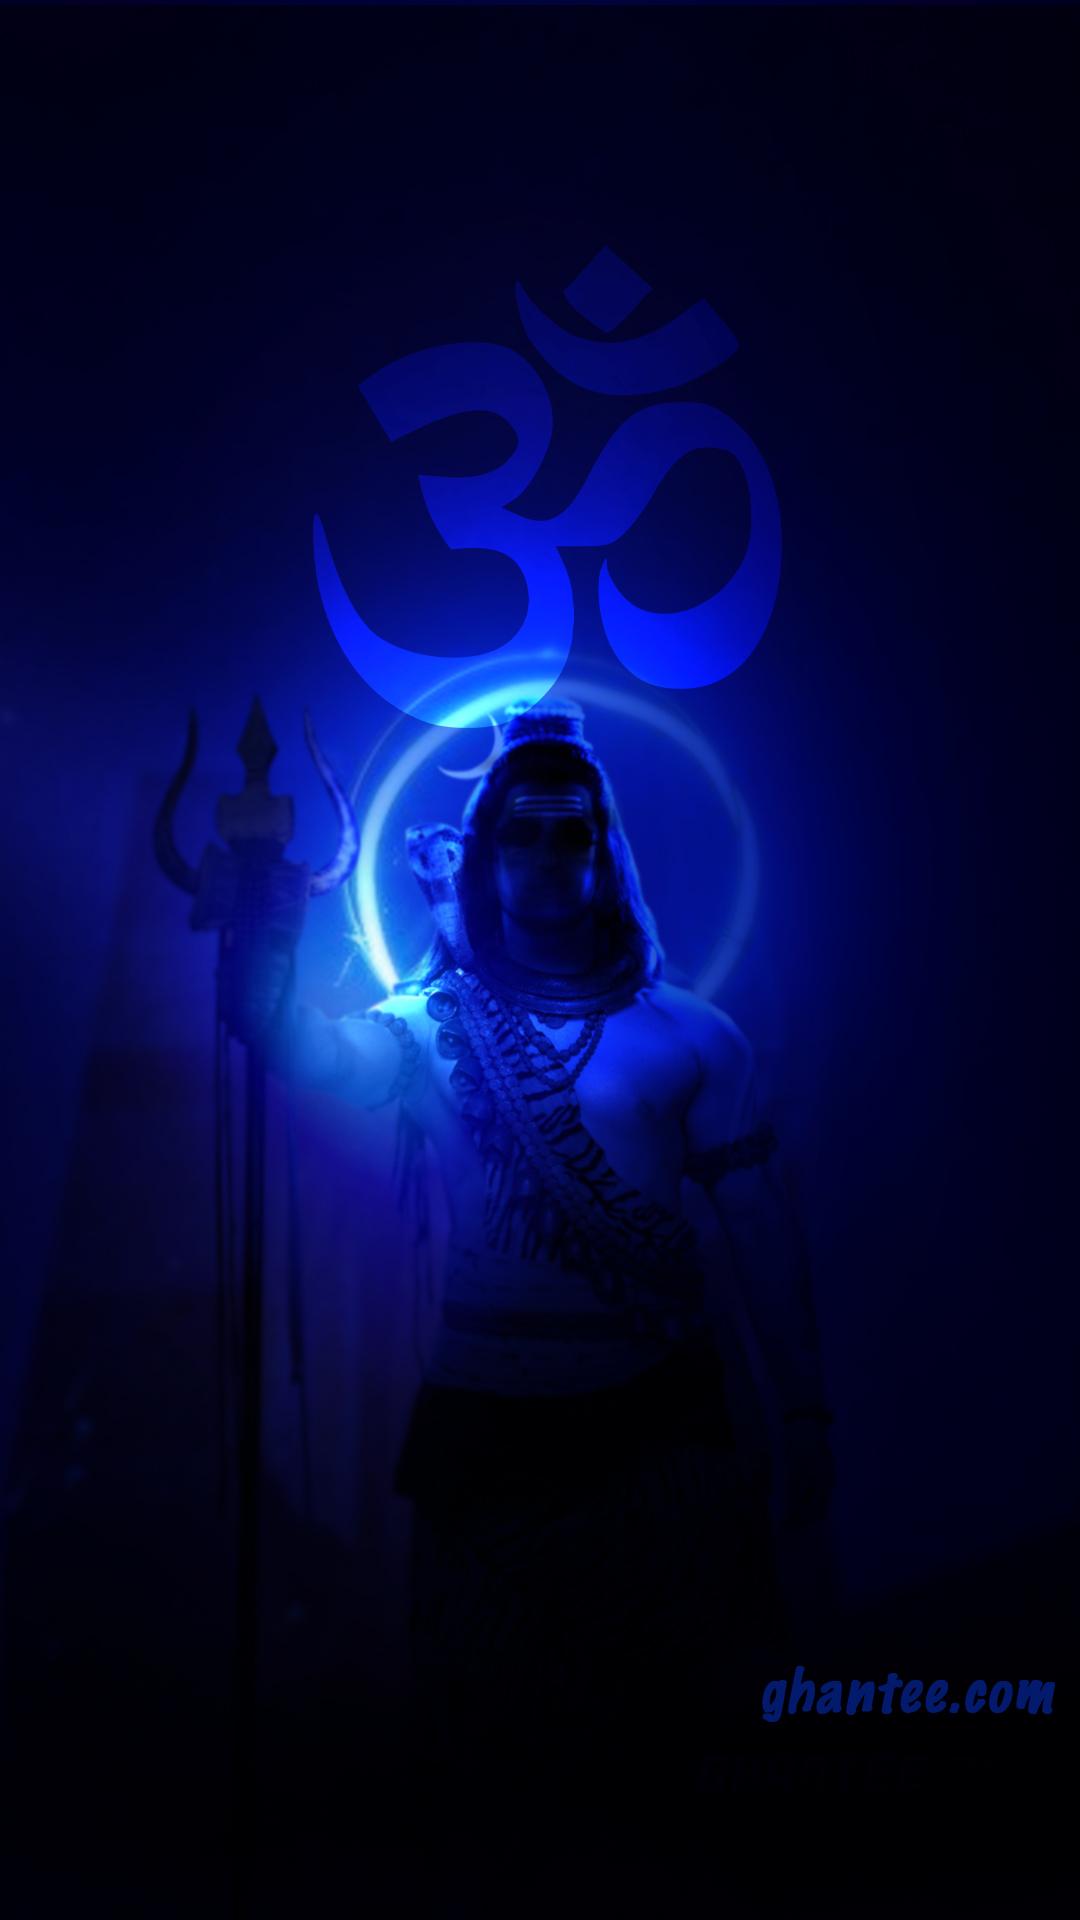 neon blue om namah shivay image